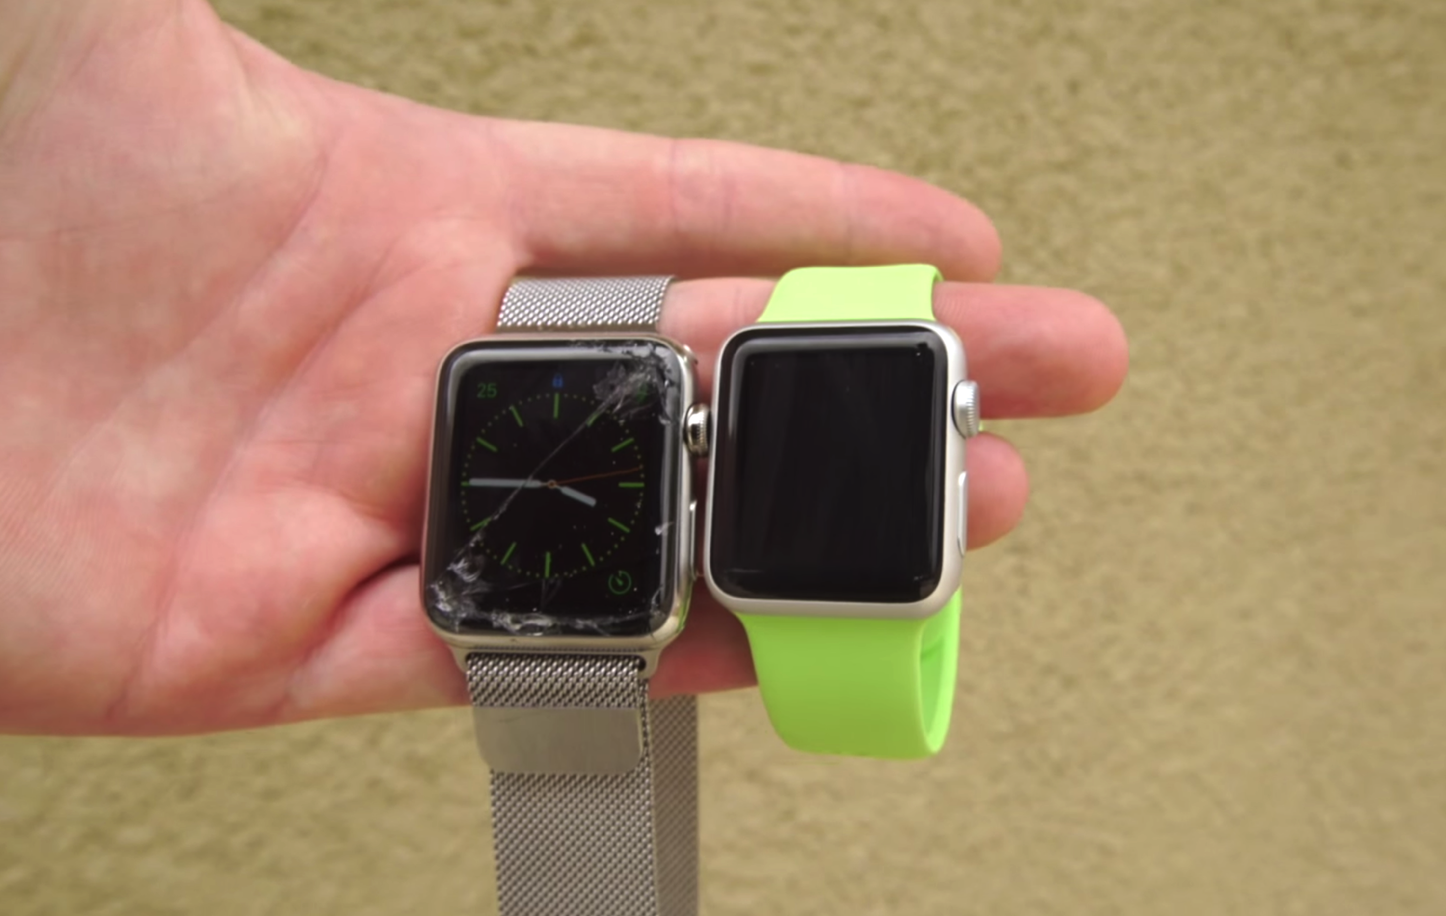 Apple-Watch-Display-Crack-3.png